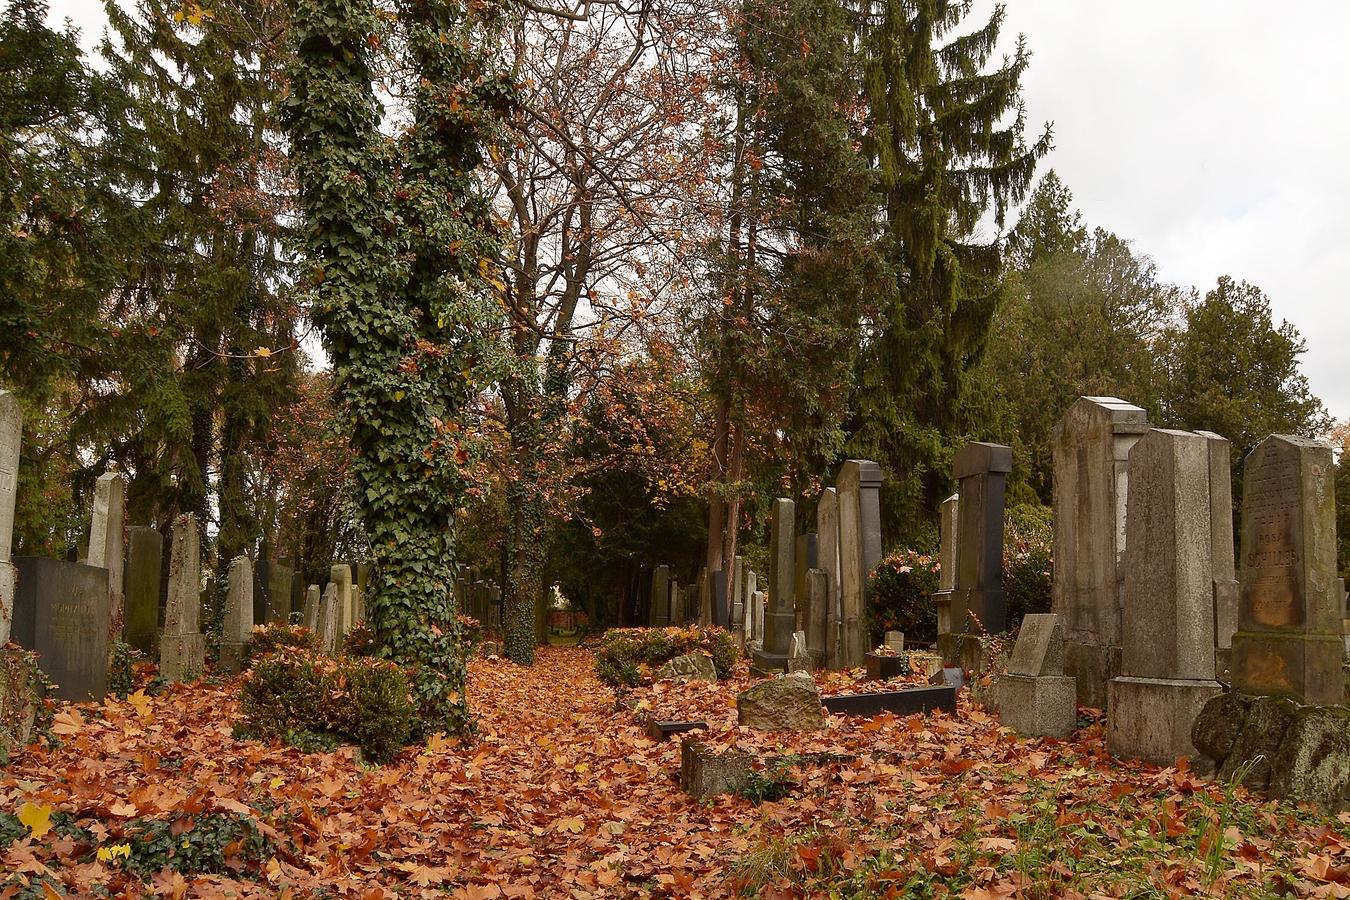 Podzim na židovkém hřbitově